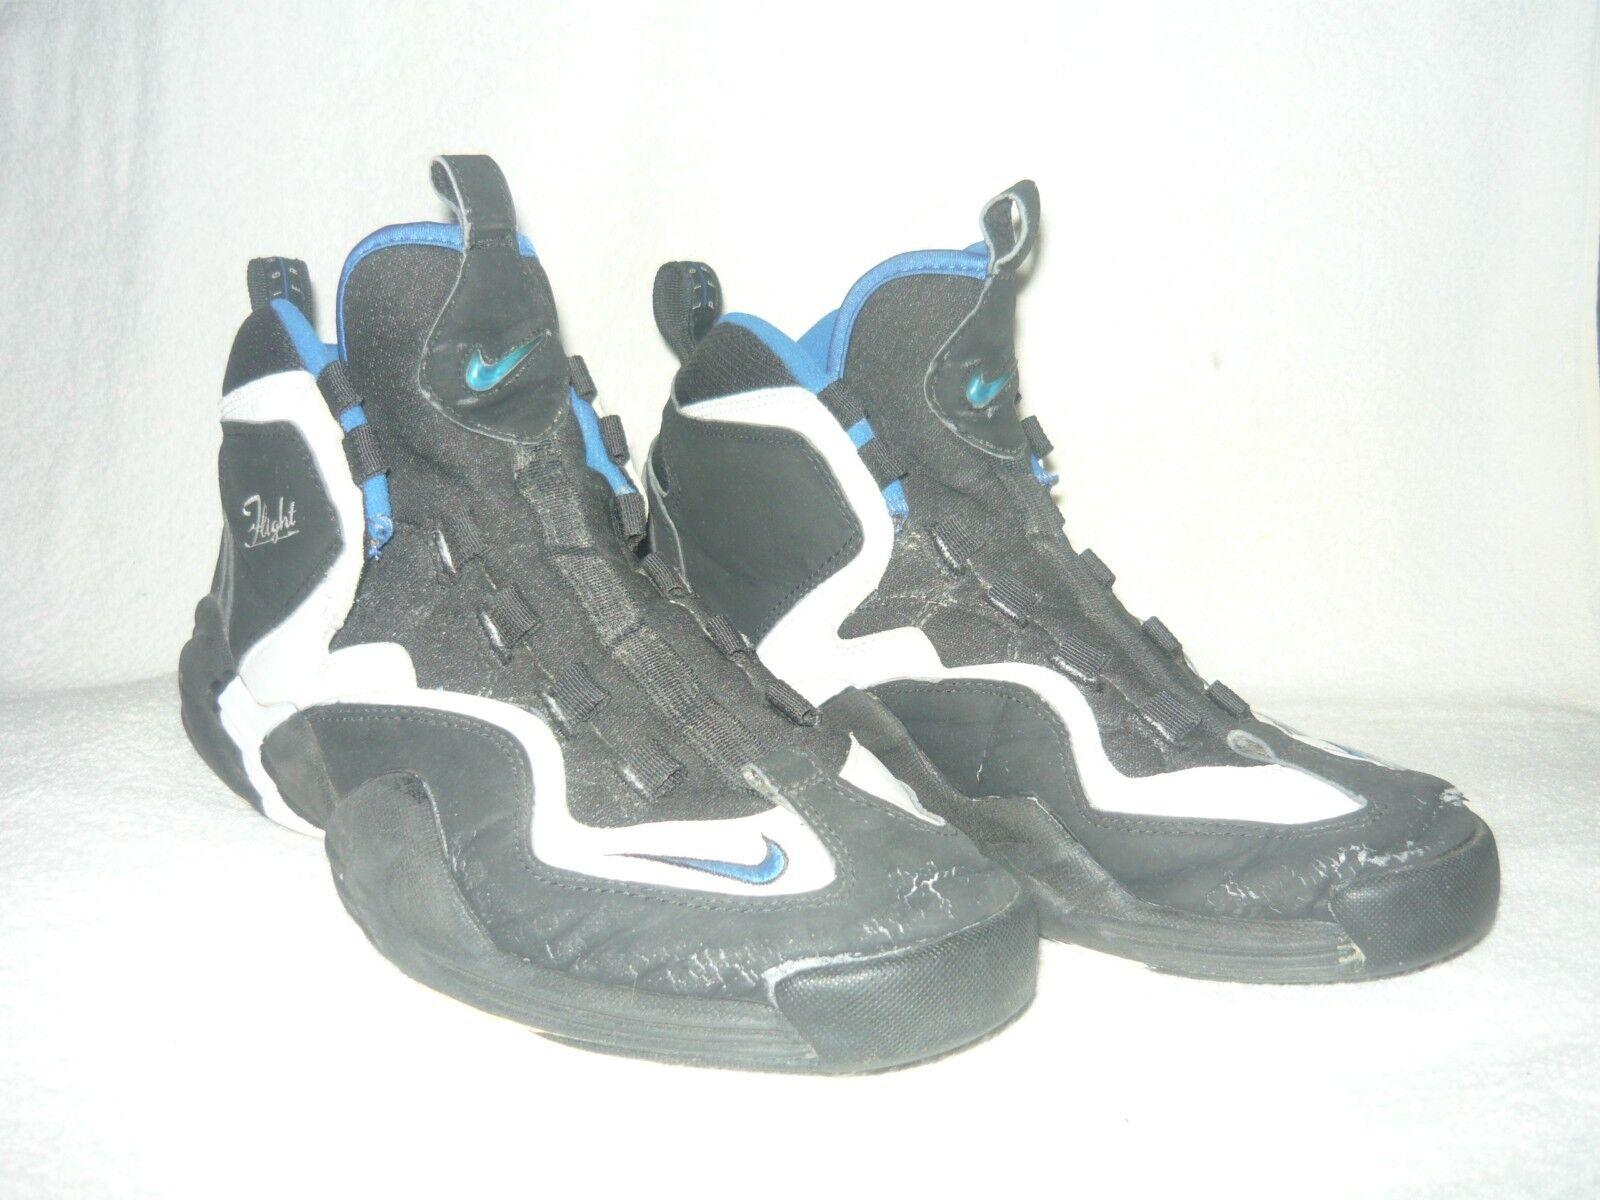 Nike LWP 130213-011 tamaño 11.5 11.5 tamaño Air Go Negro-Blanco-Azul 2018 Original f75753